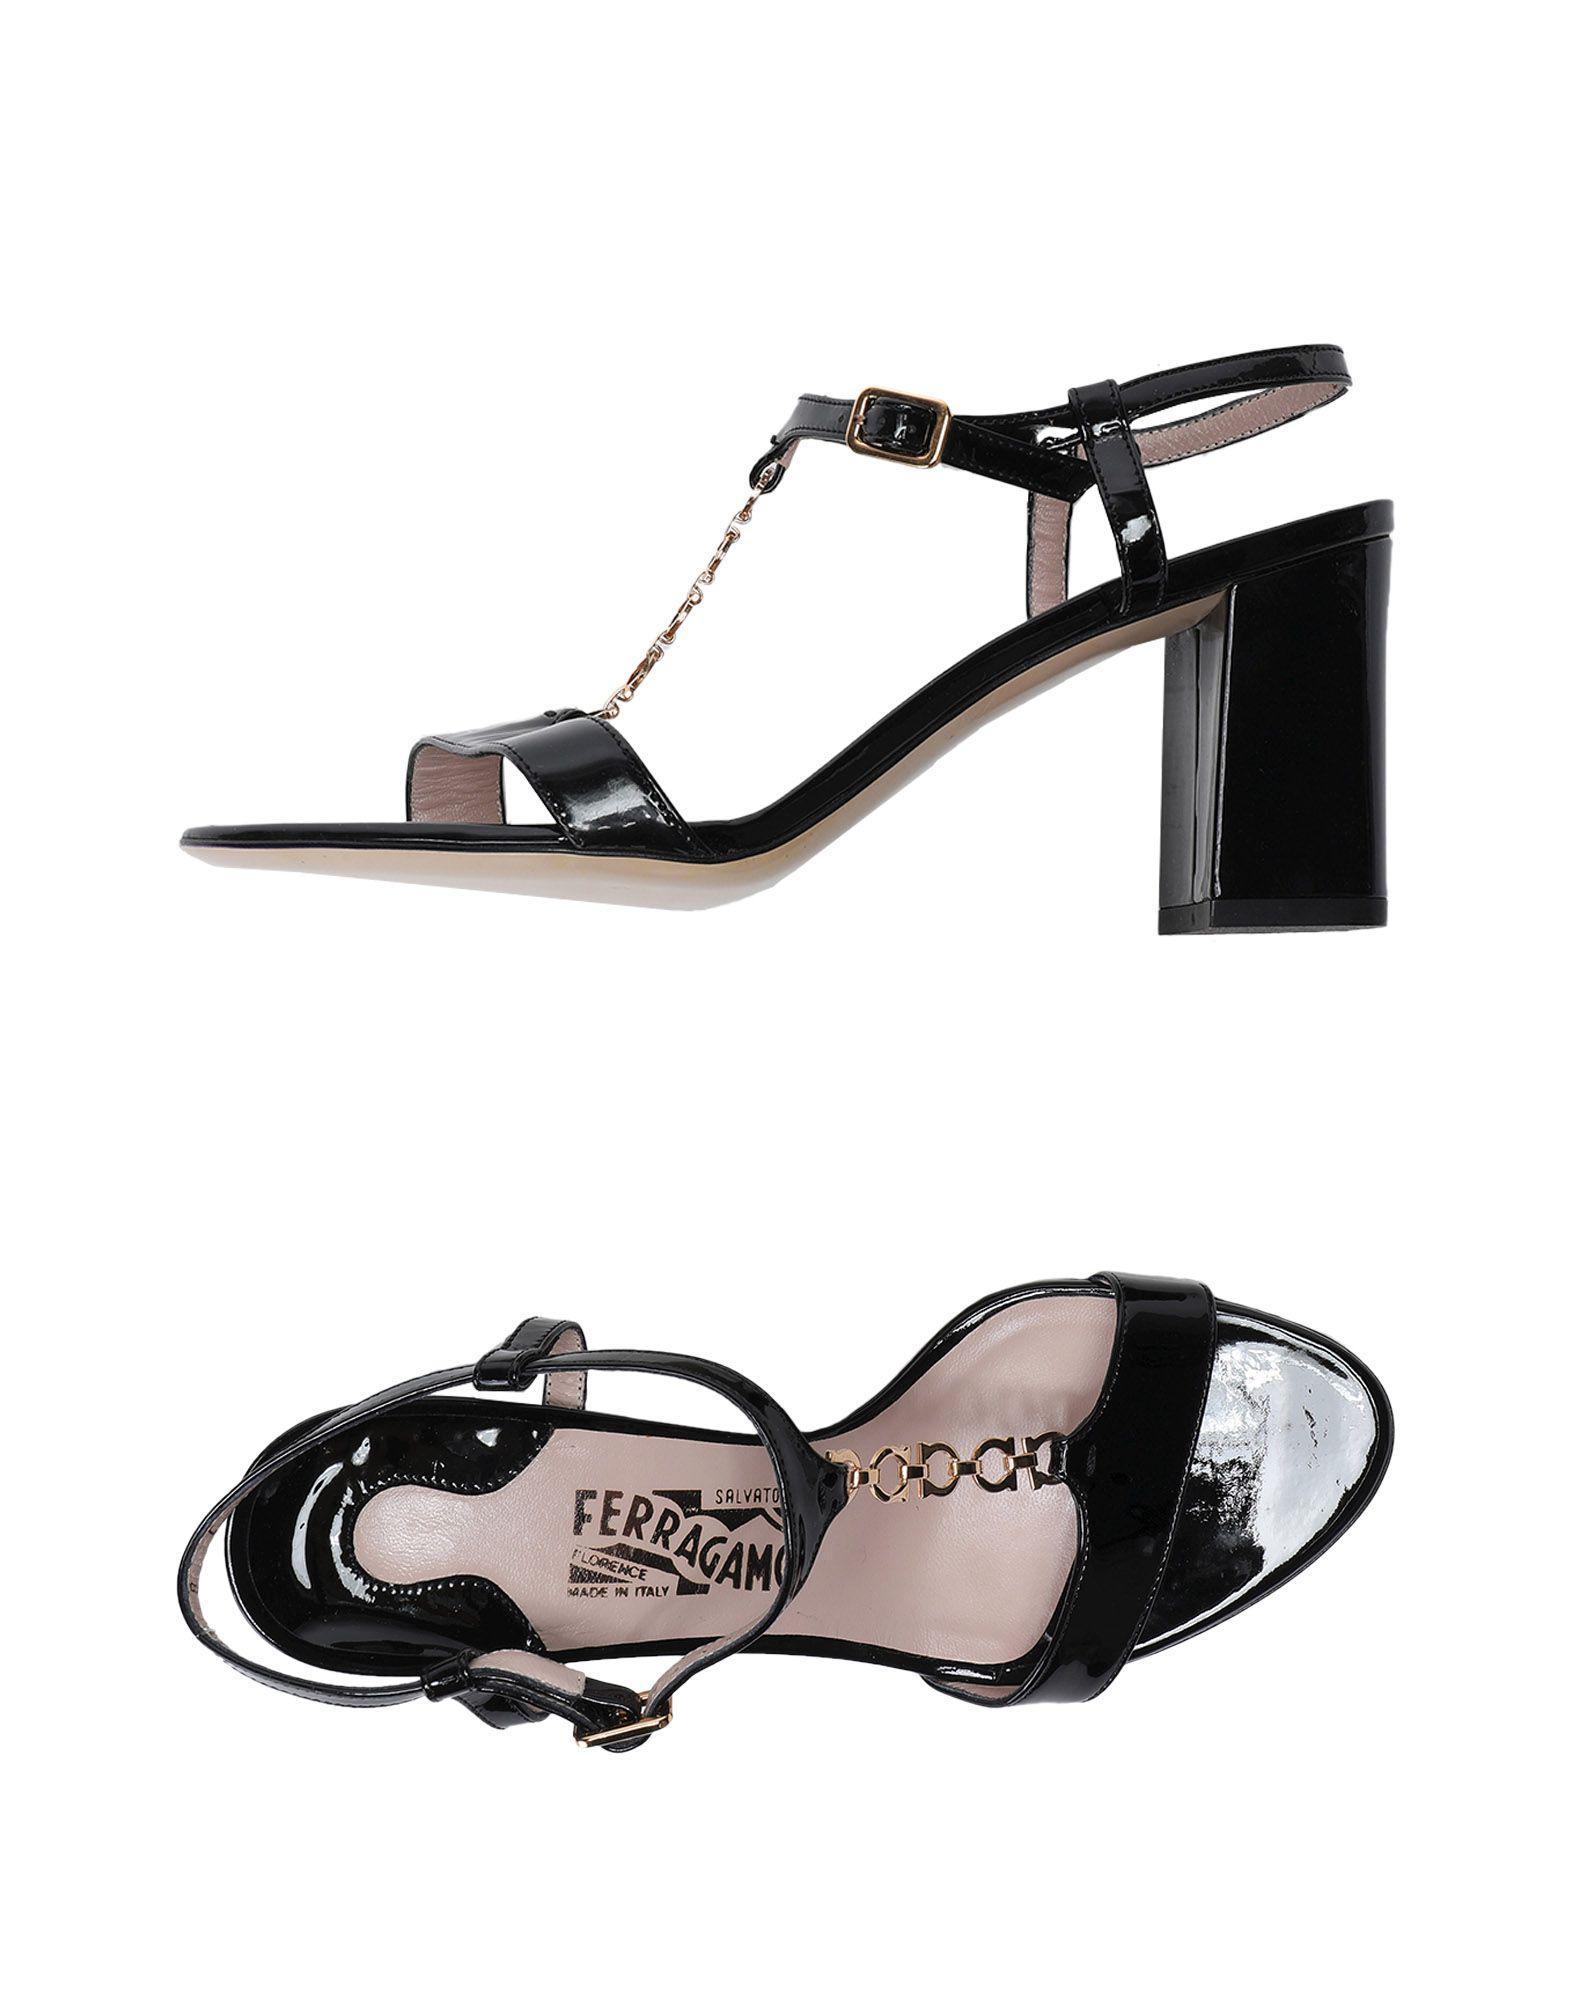 05b5325d0755 Lyst - Ferragamo Sandals in Black